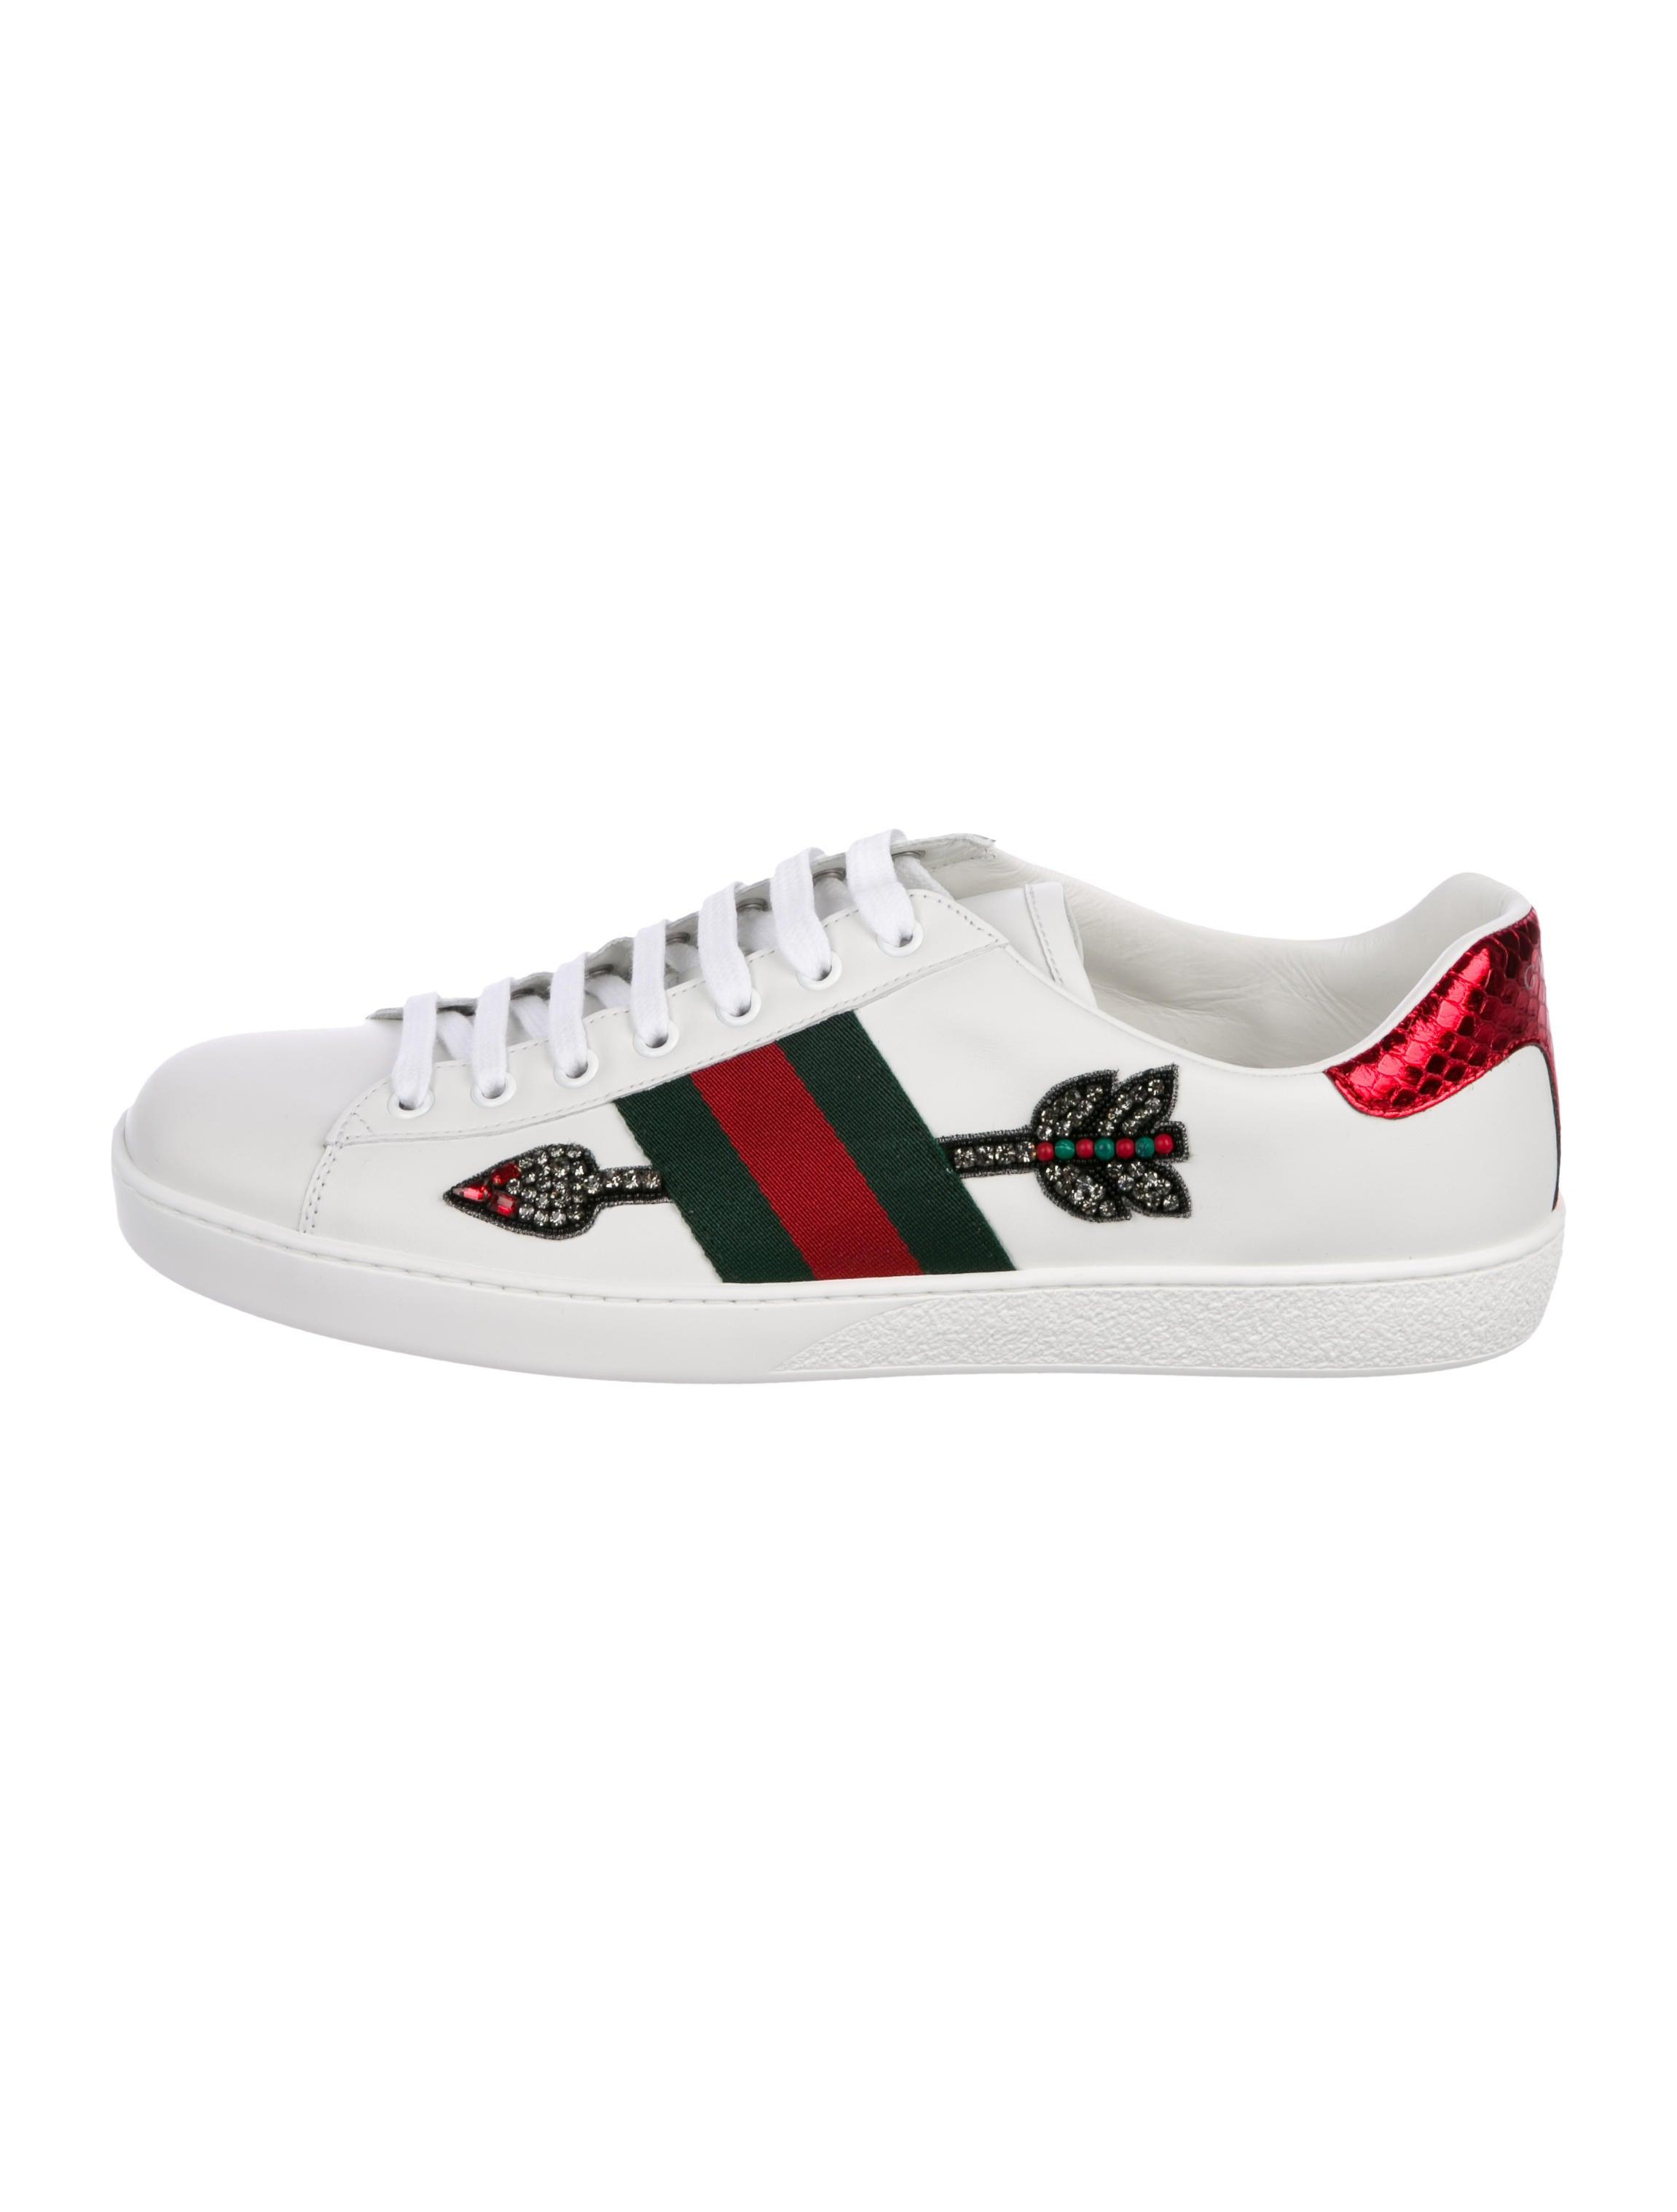 Gucci 2018 Bleeding Arrow Ace Sneakers